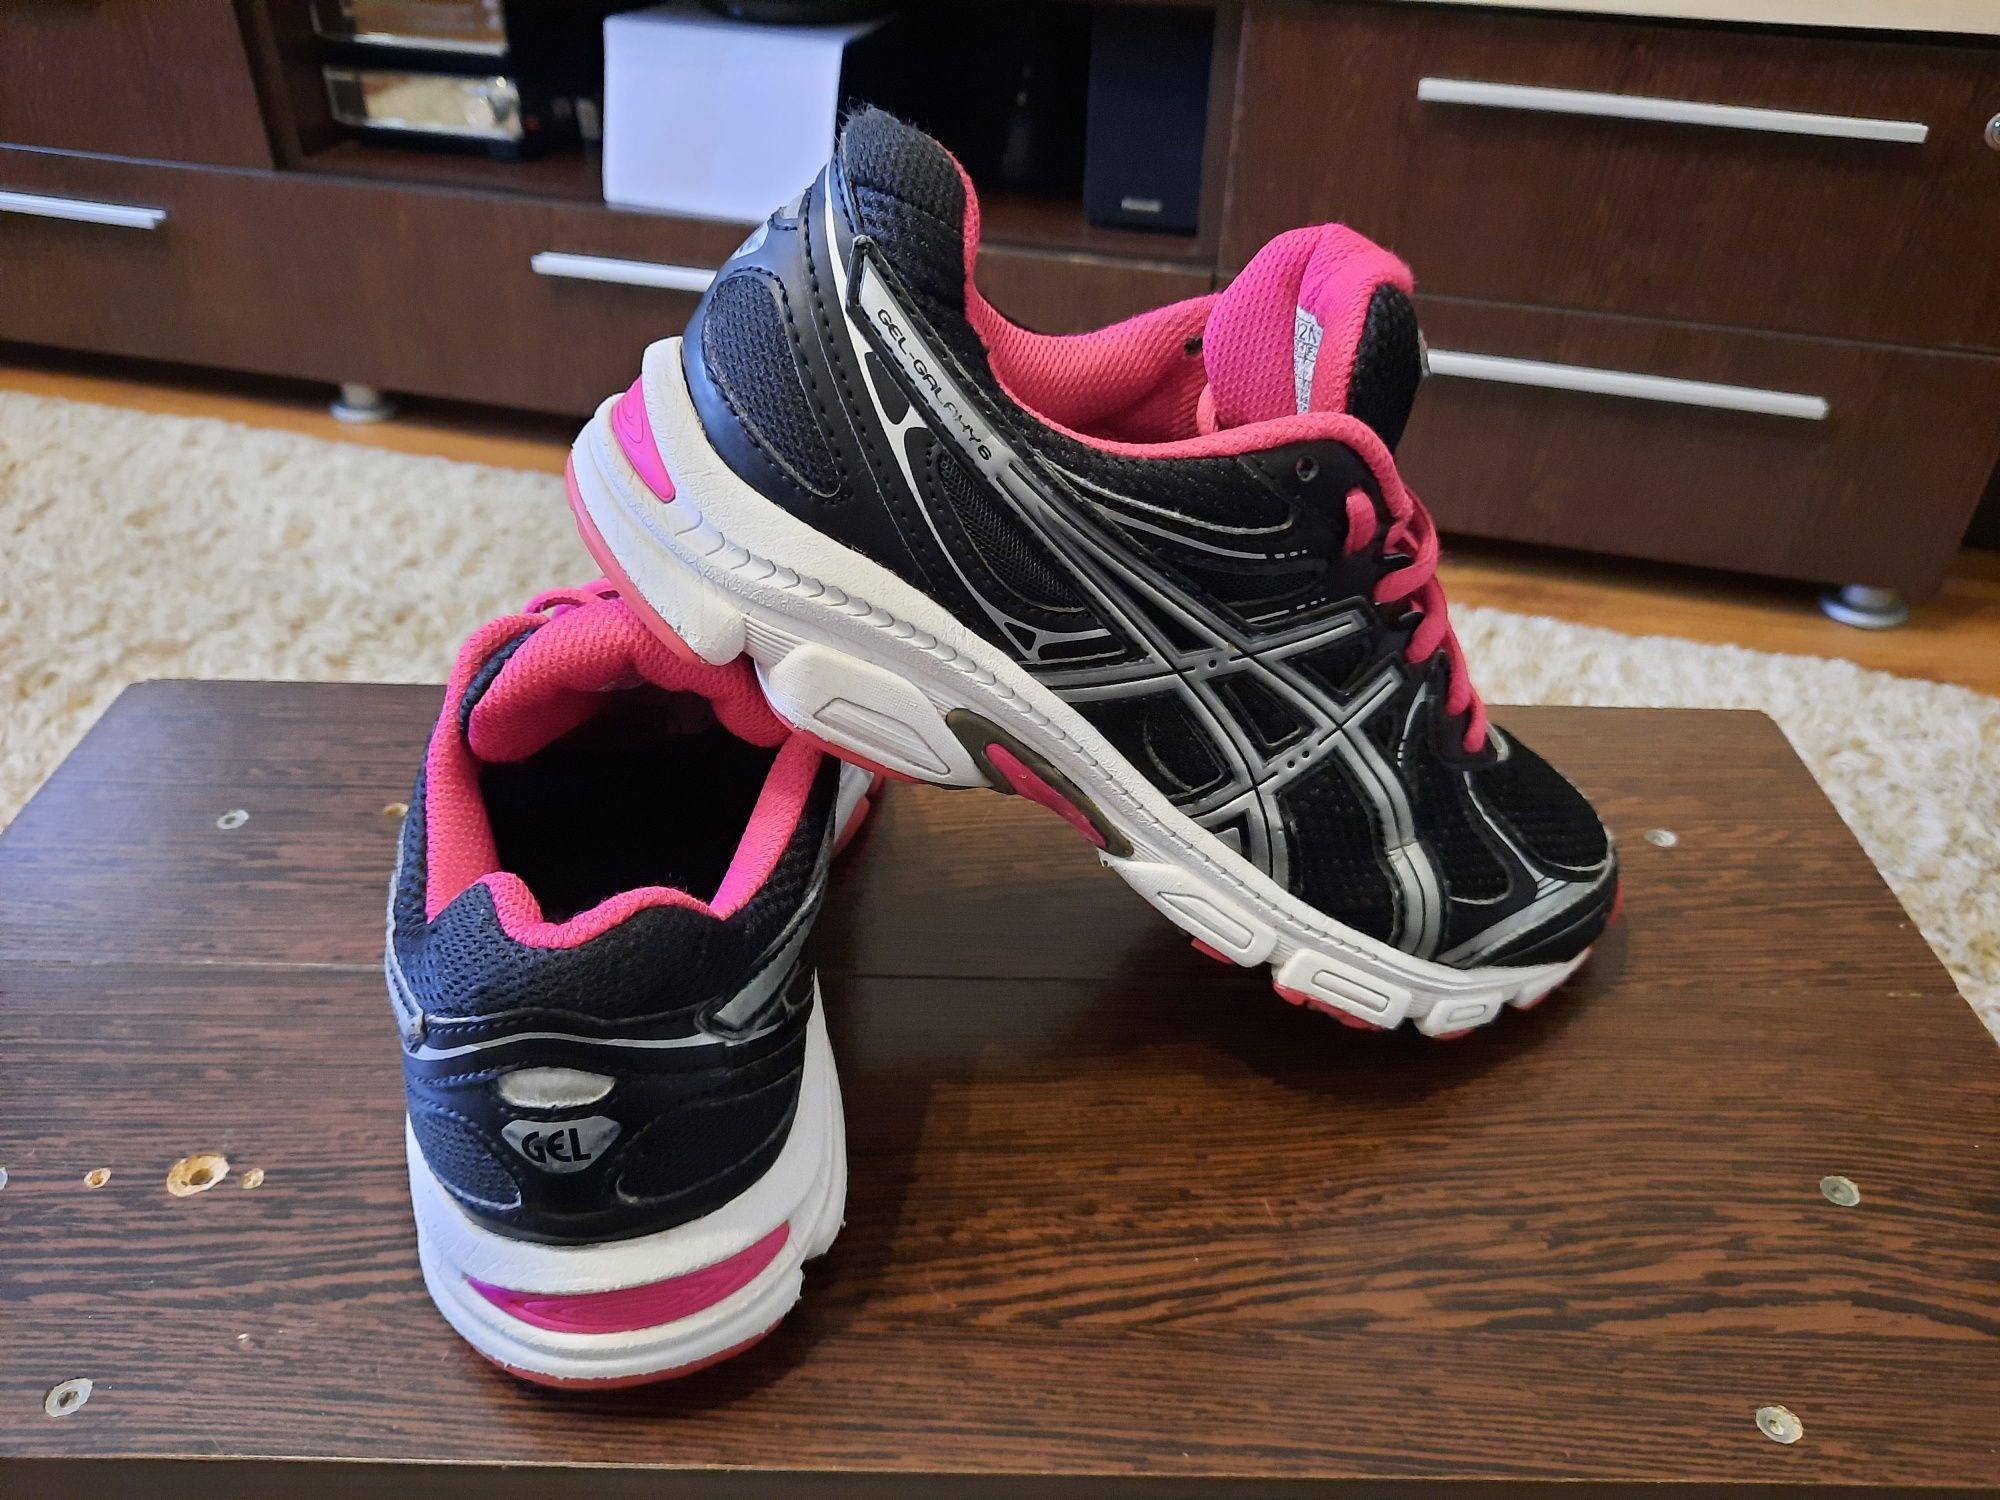 Adidași Asics Gel,mărimea38-25cm.Originali.Running&fitness.79 lei.